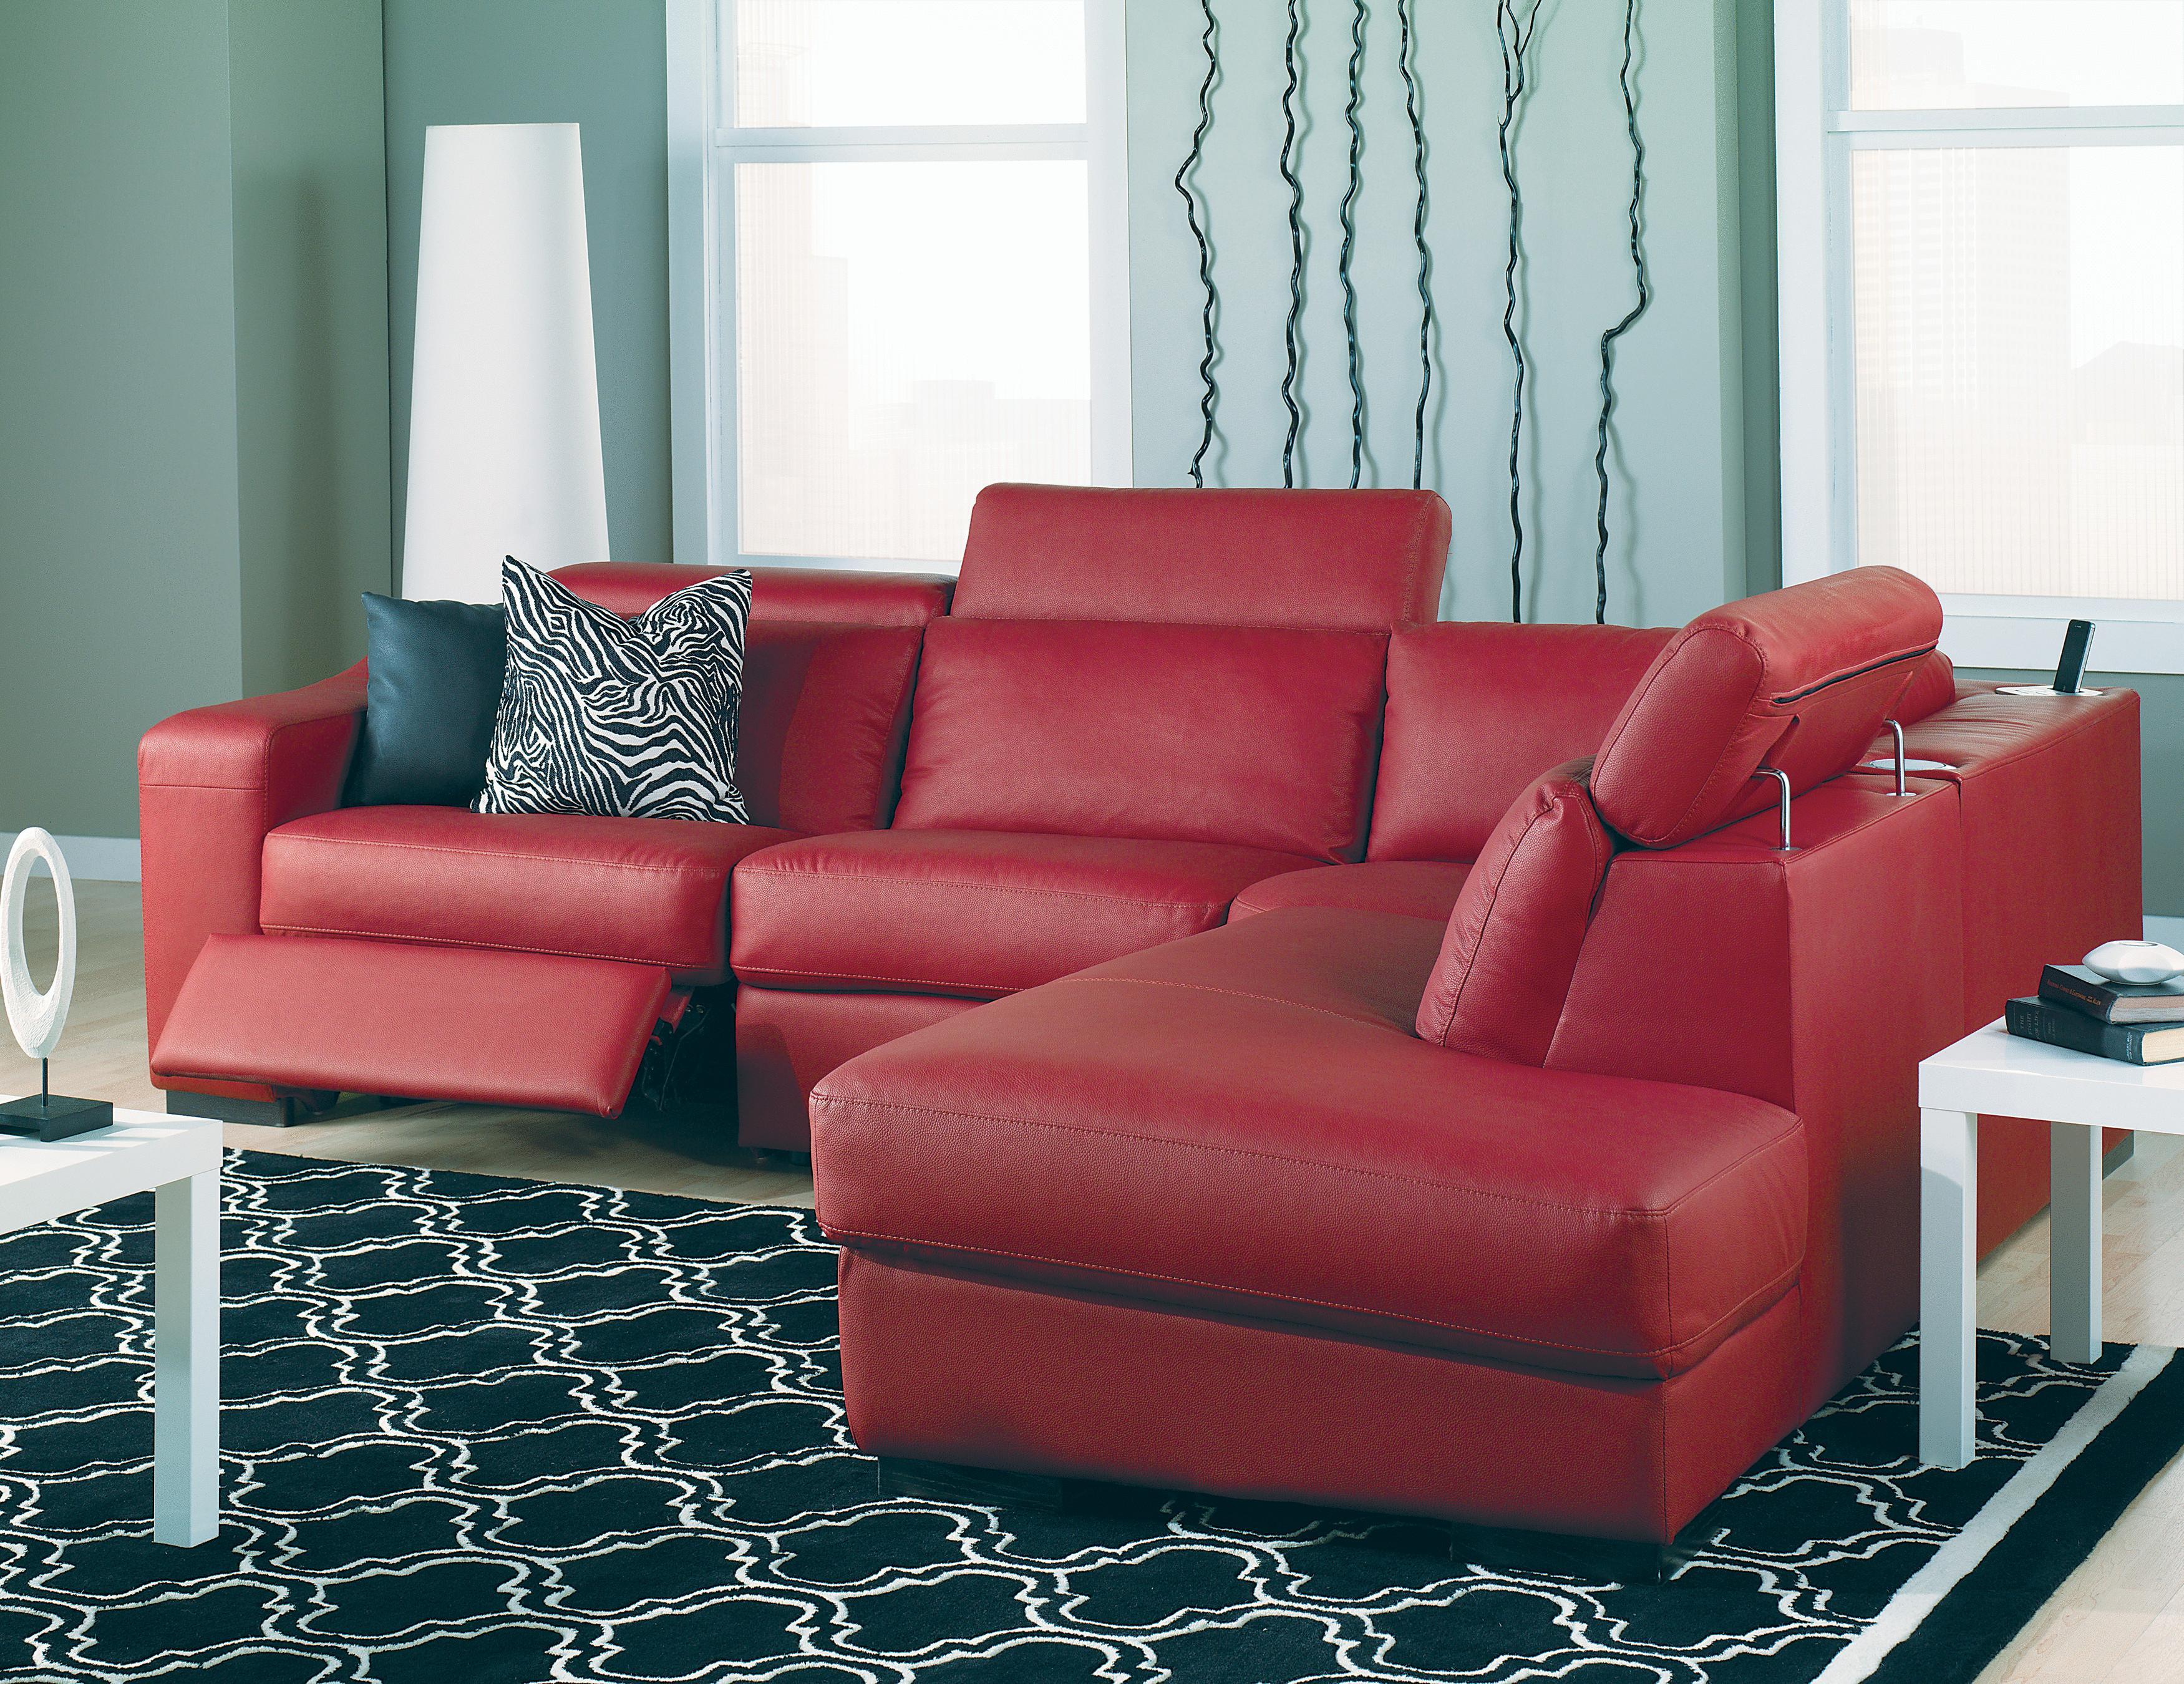 palliser stationary sofas norwalk sofa and chair cortez ii right hand facing 4 pc